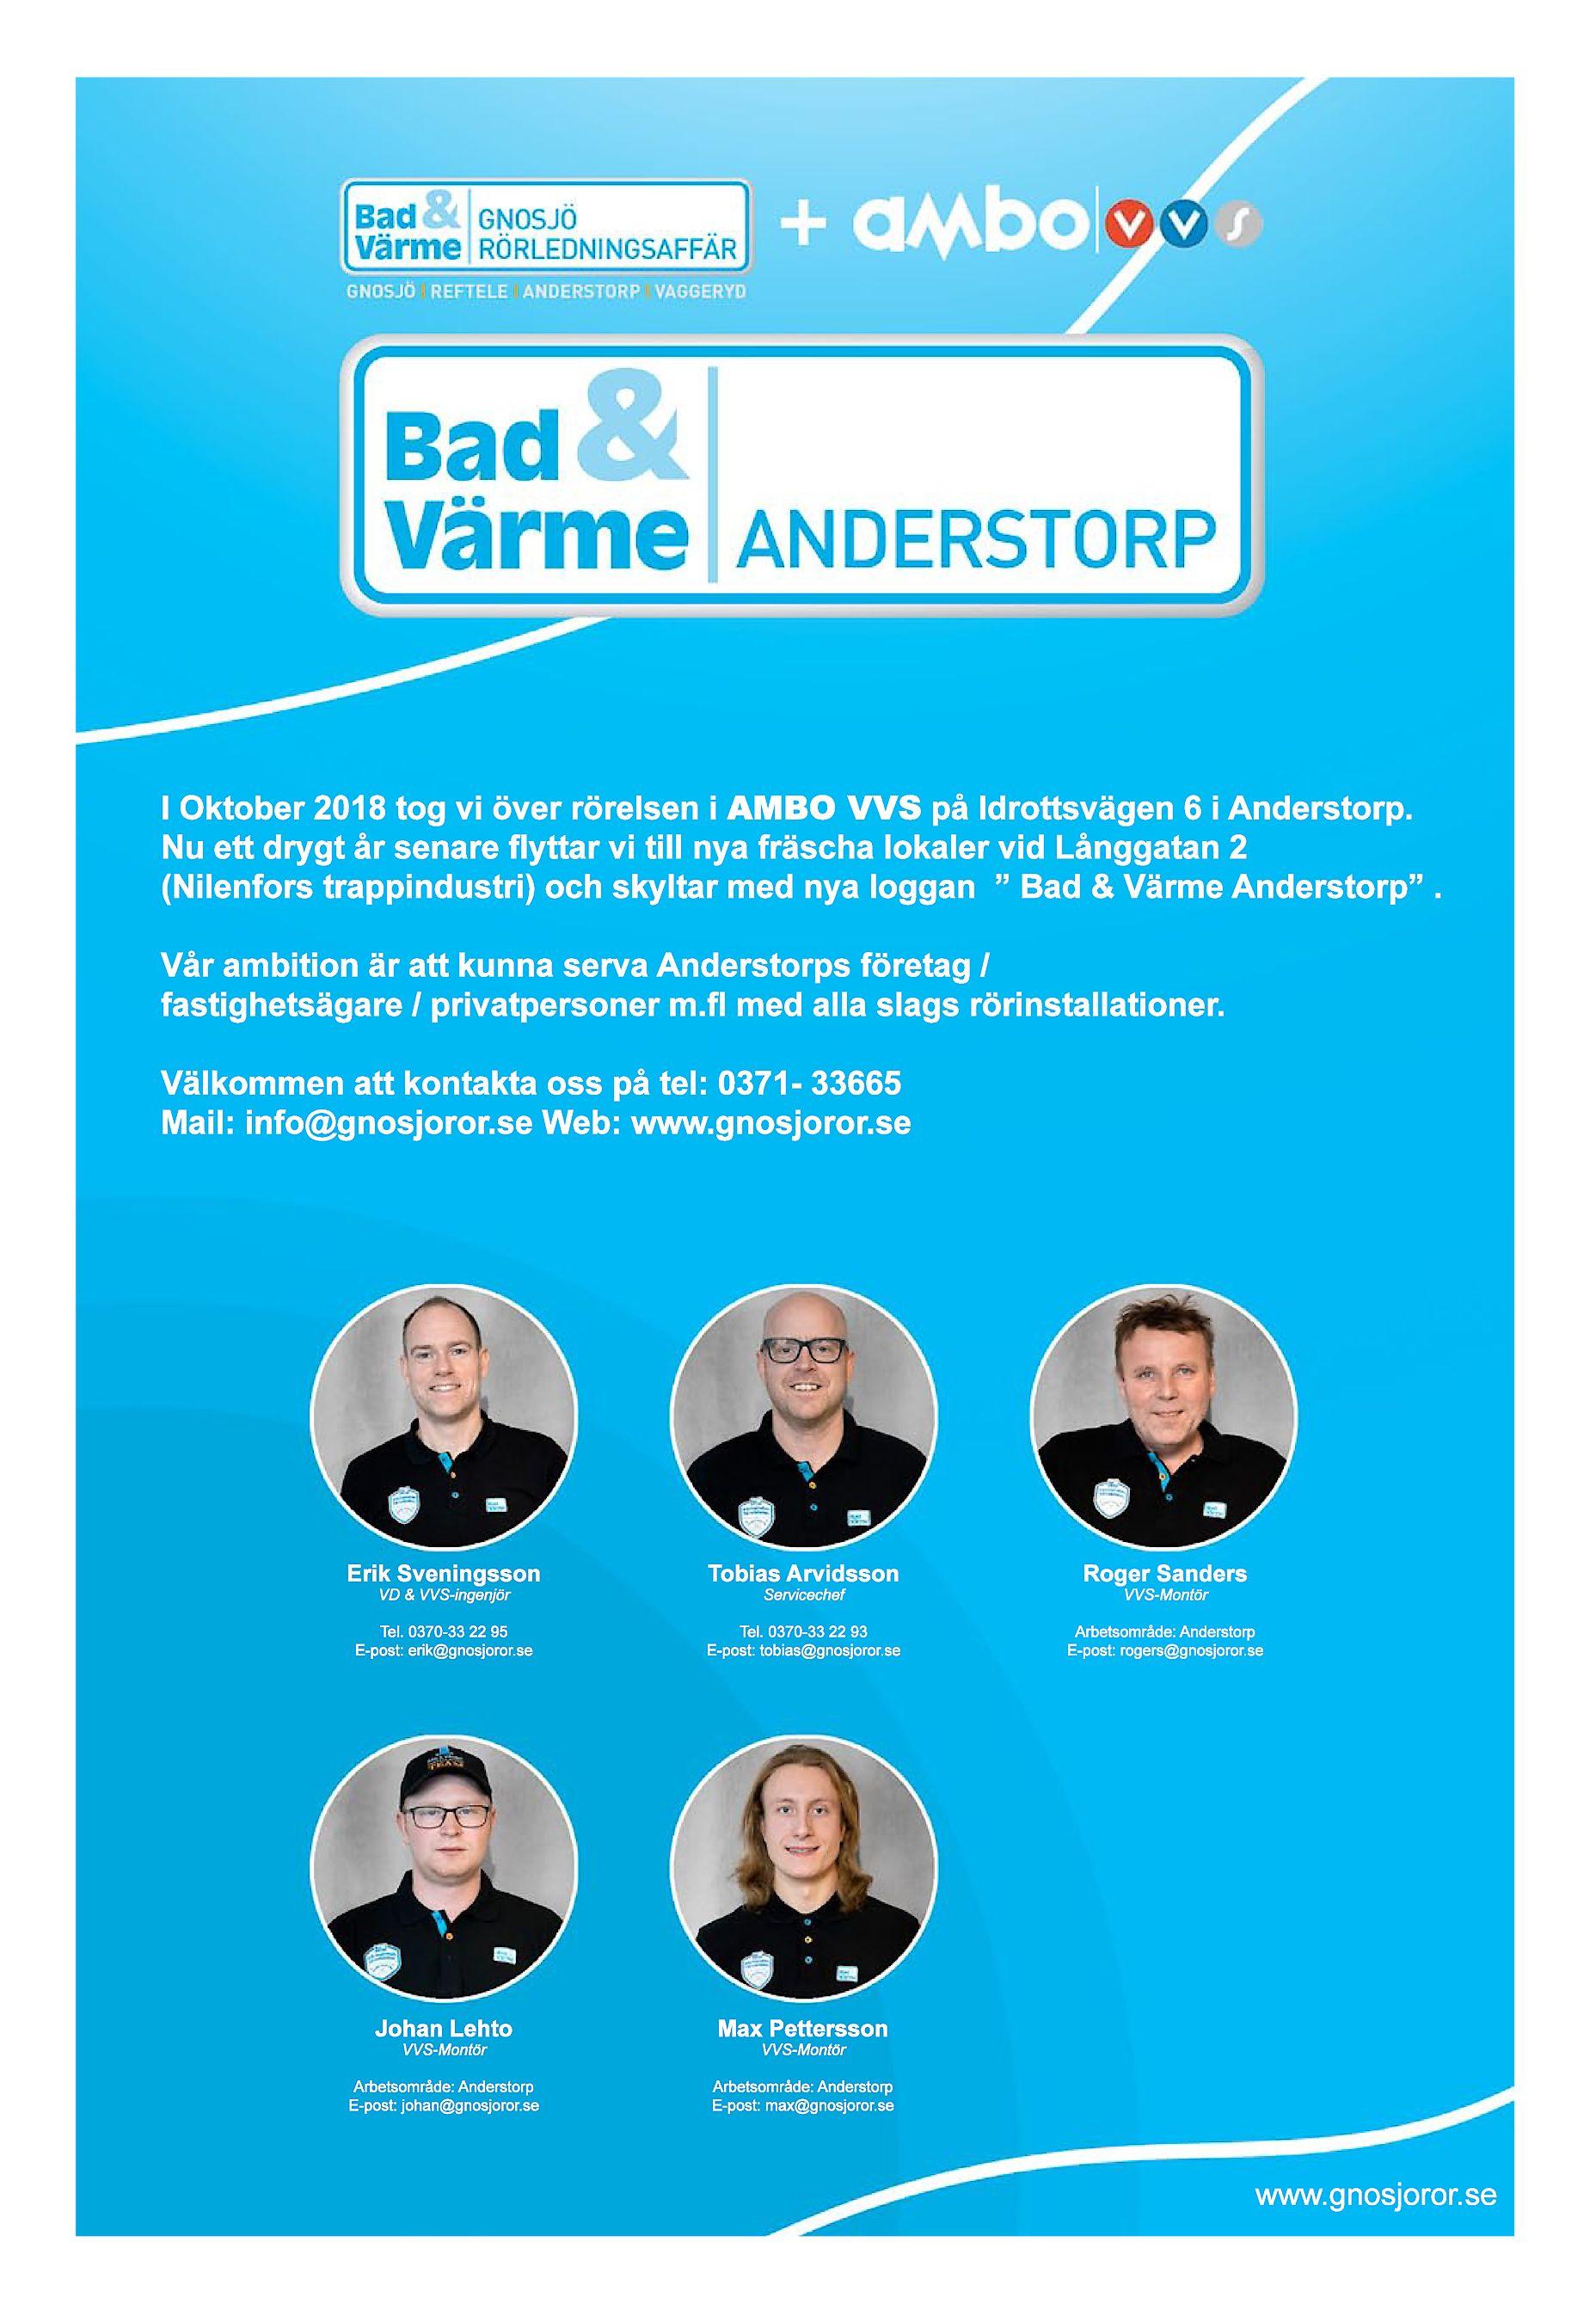 Yaser Kaj, Torsplan 8A, Anderstorp | patient-survey.net